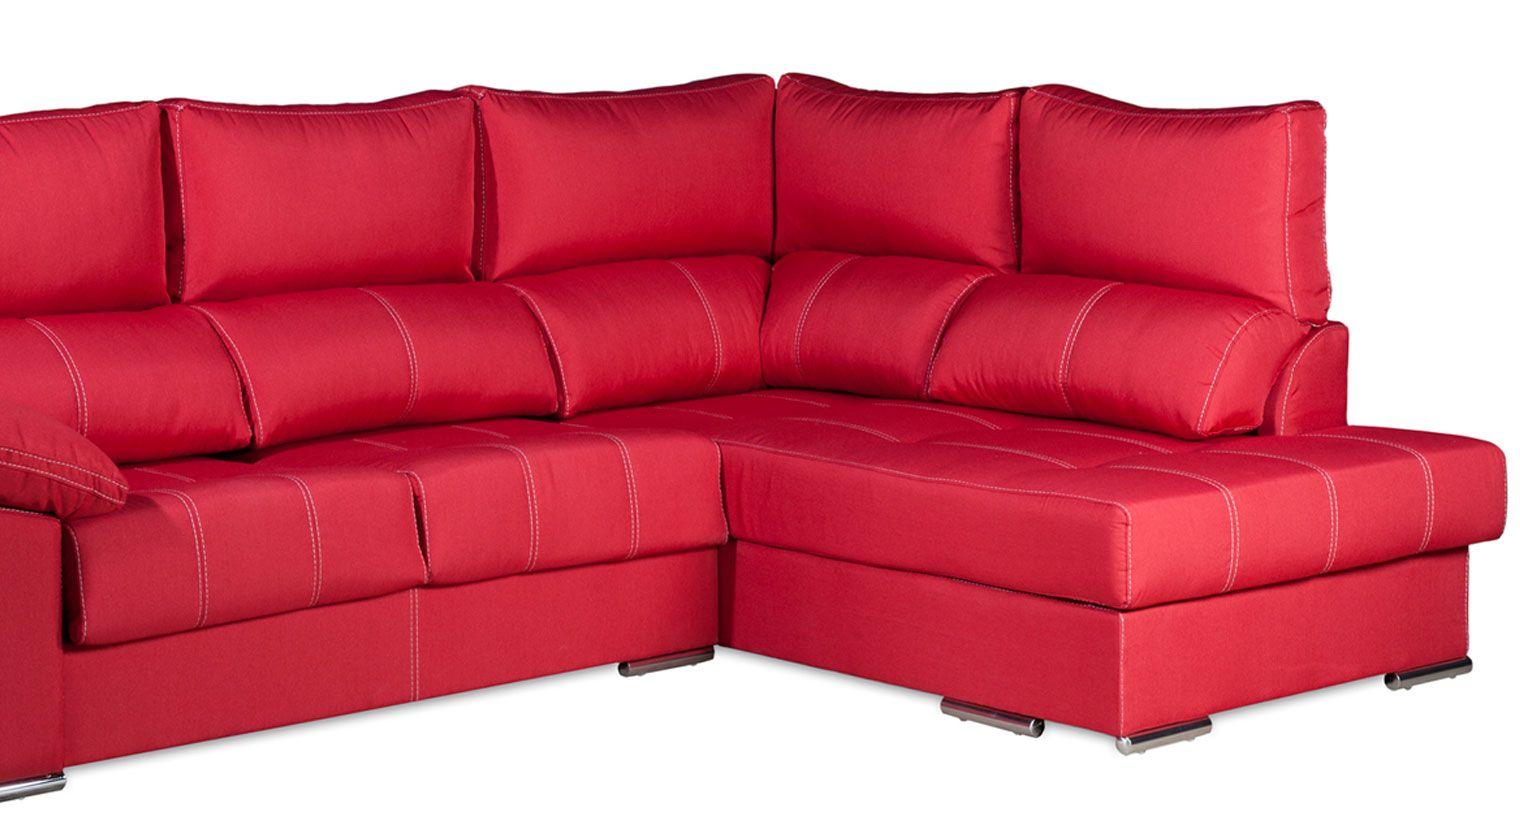 Chaise longue duplo chaise longue tela for Chaise longue interiores